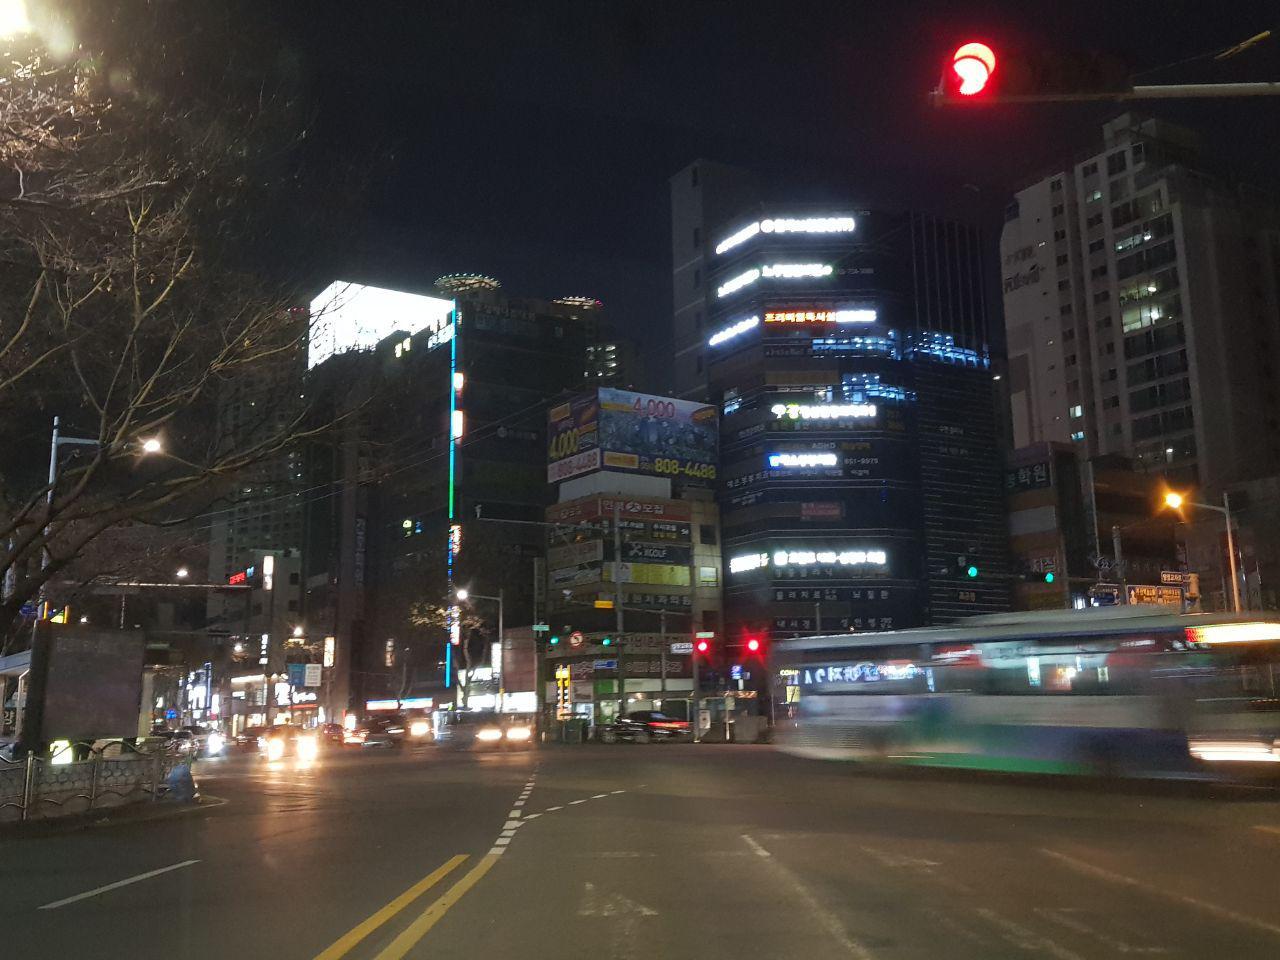 photo_2019-03-25_18-57-16.jpg